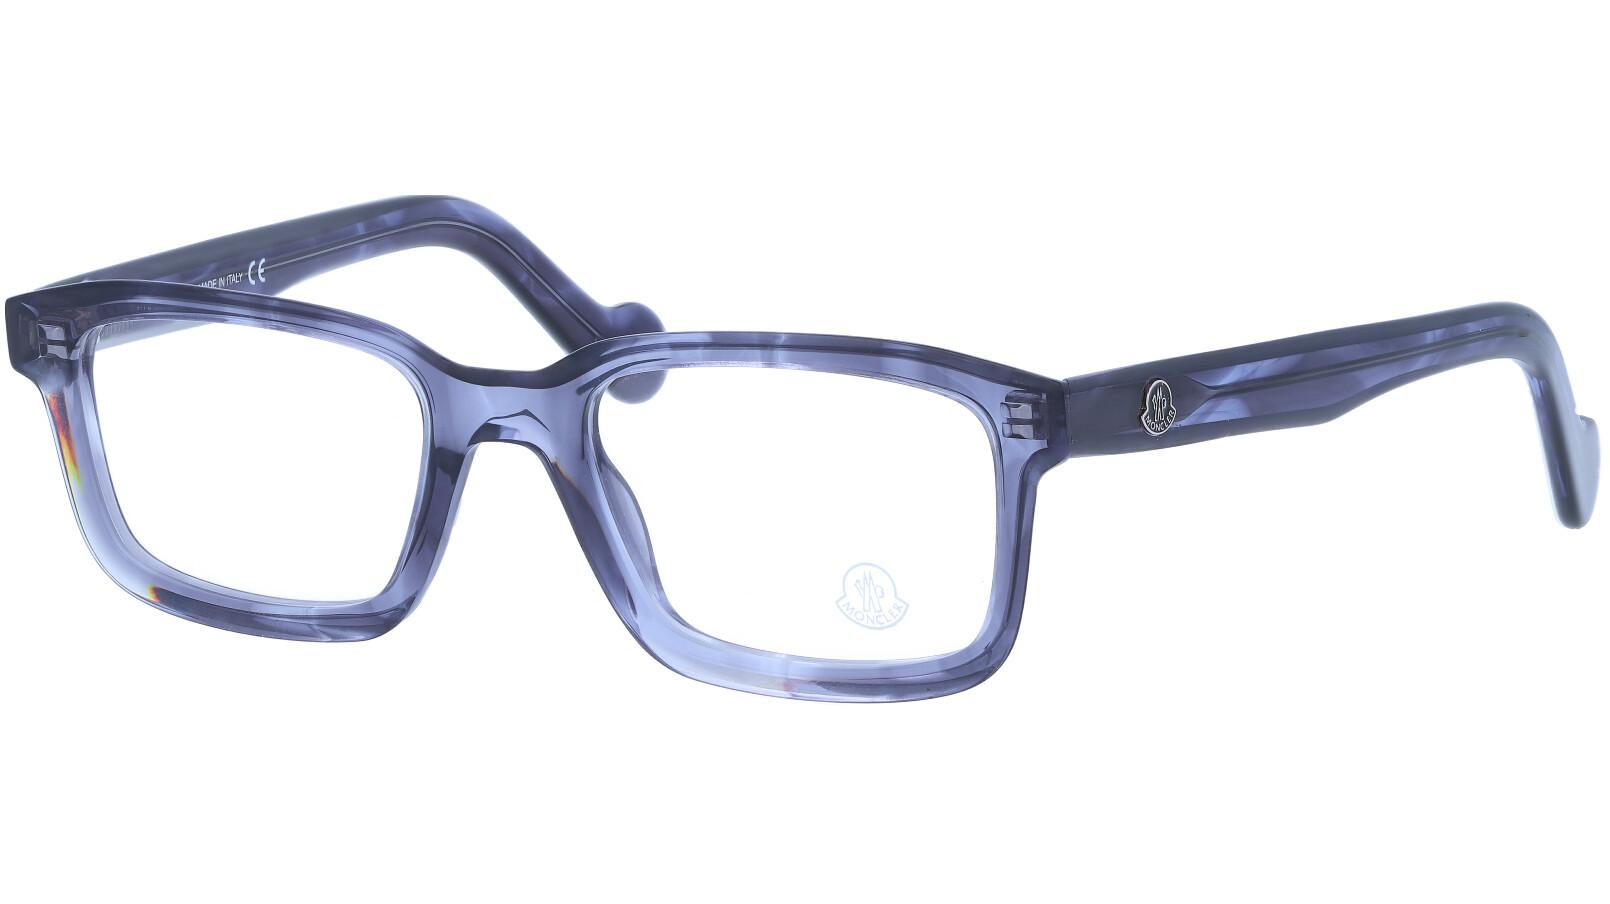 Moncler ML5004 092 52 Grey Glasses